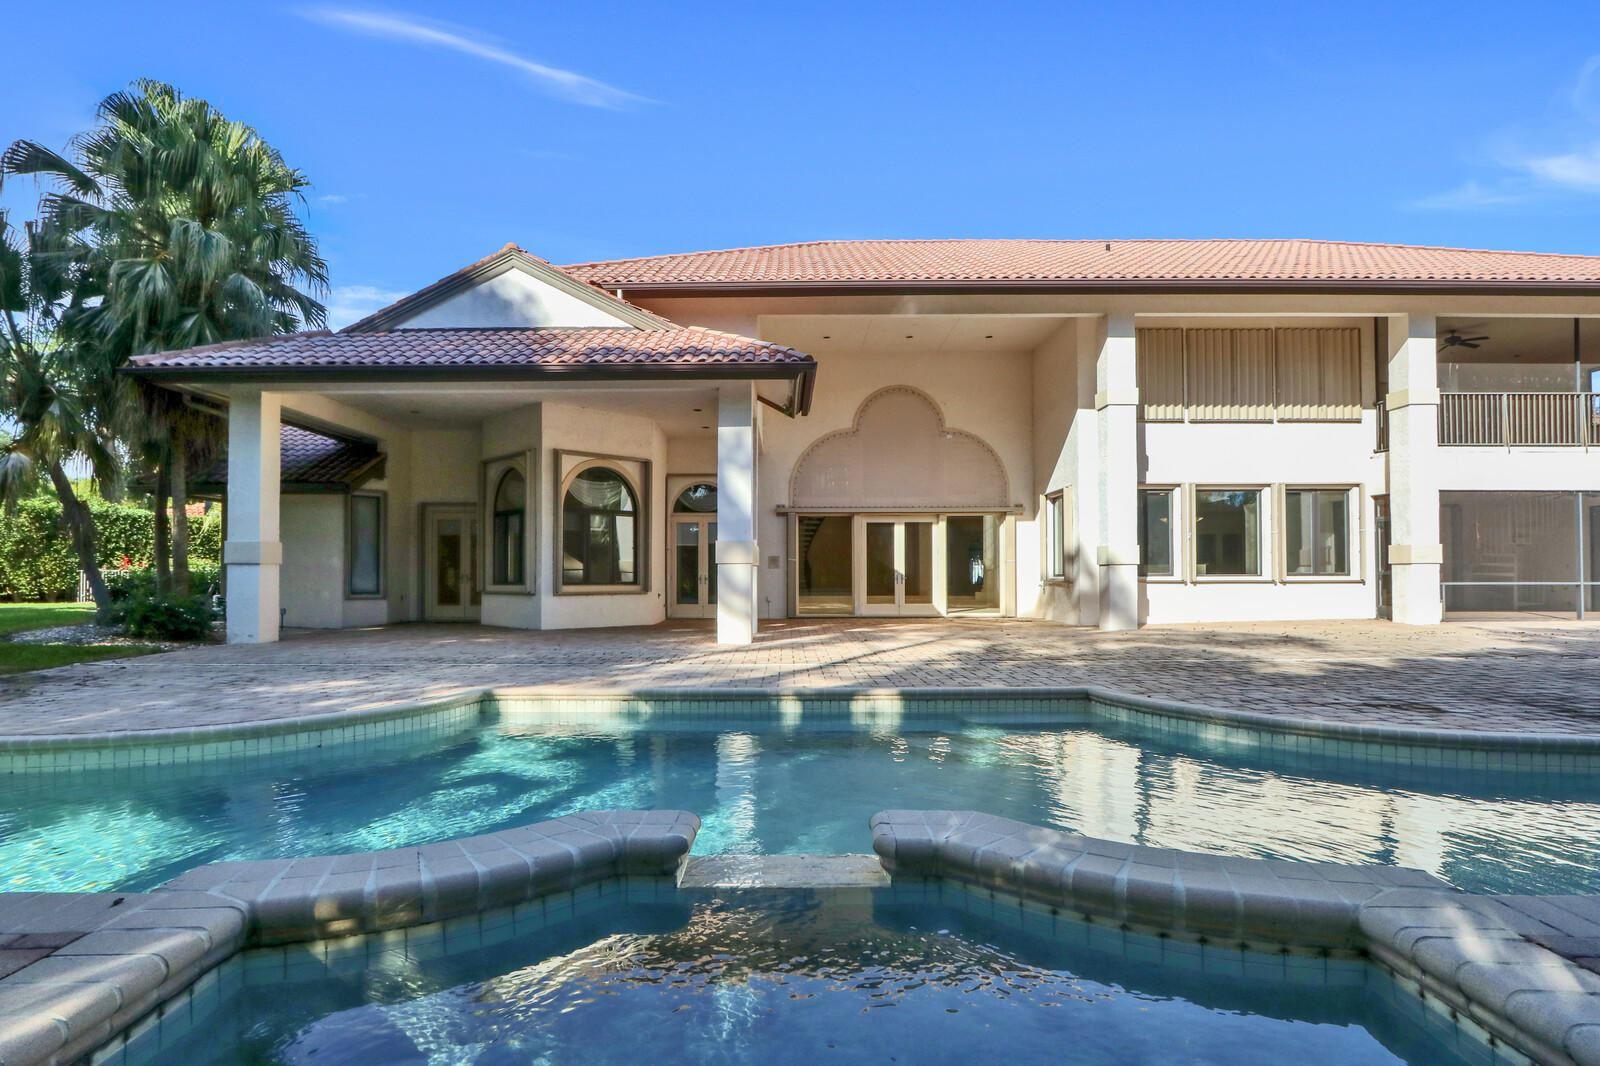 Photo of 3140 Miro Drive S, Palm Beach Gardens, FL 33410 (MLS # RX-10682140)